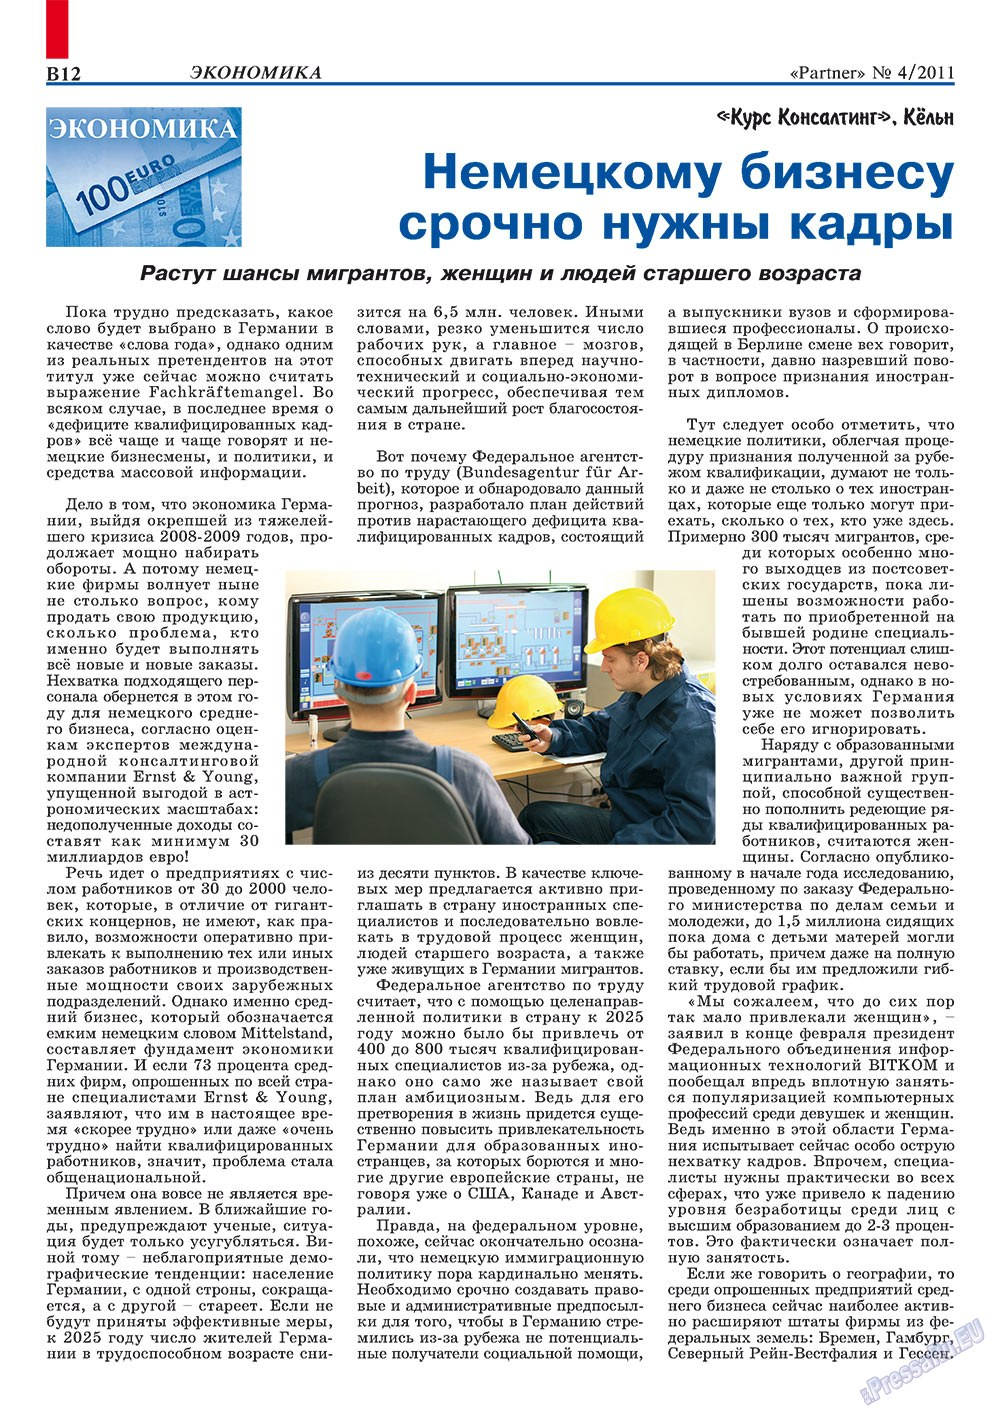 Партнер-север (журнал). 2011 год, номер 4, стр. 22